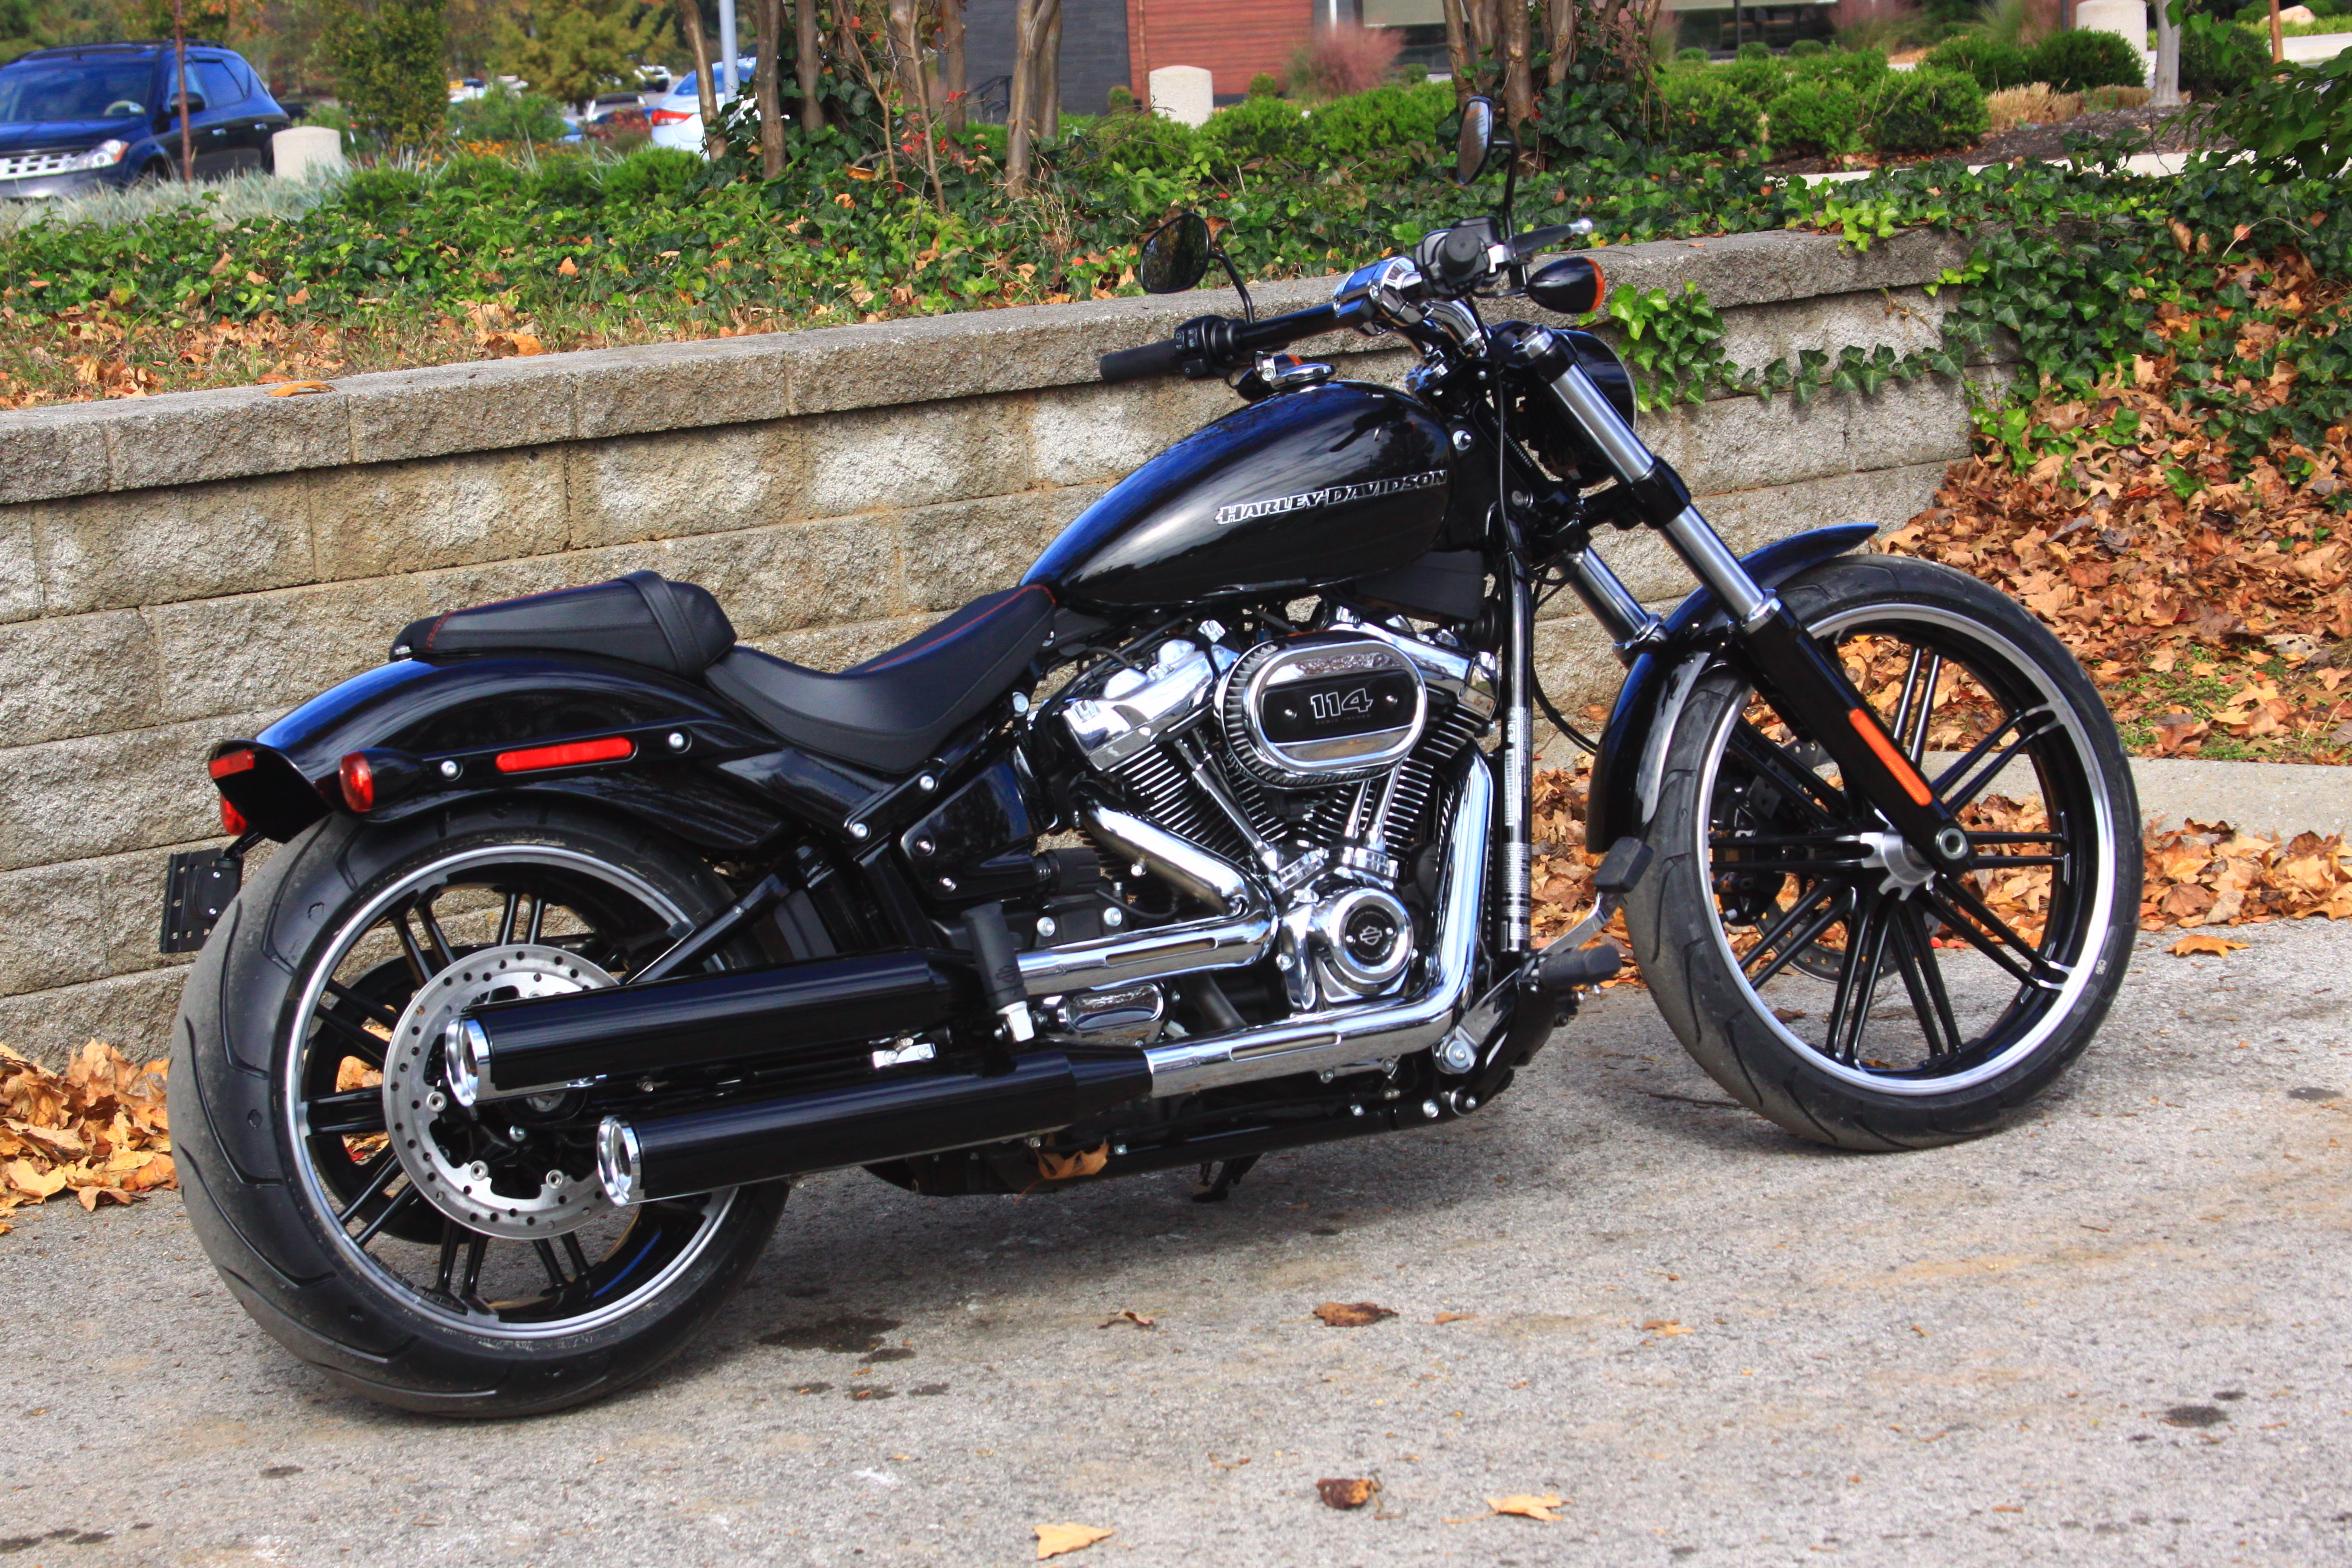 New 2019 Harley-Davidson Softail Breakout